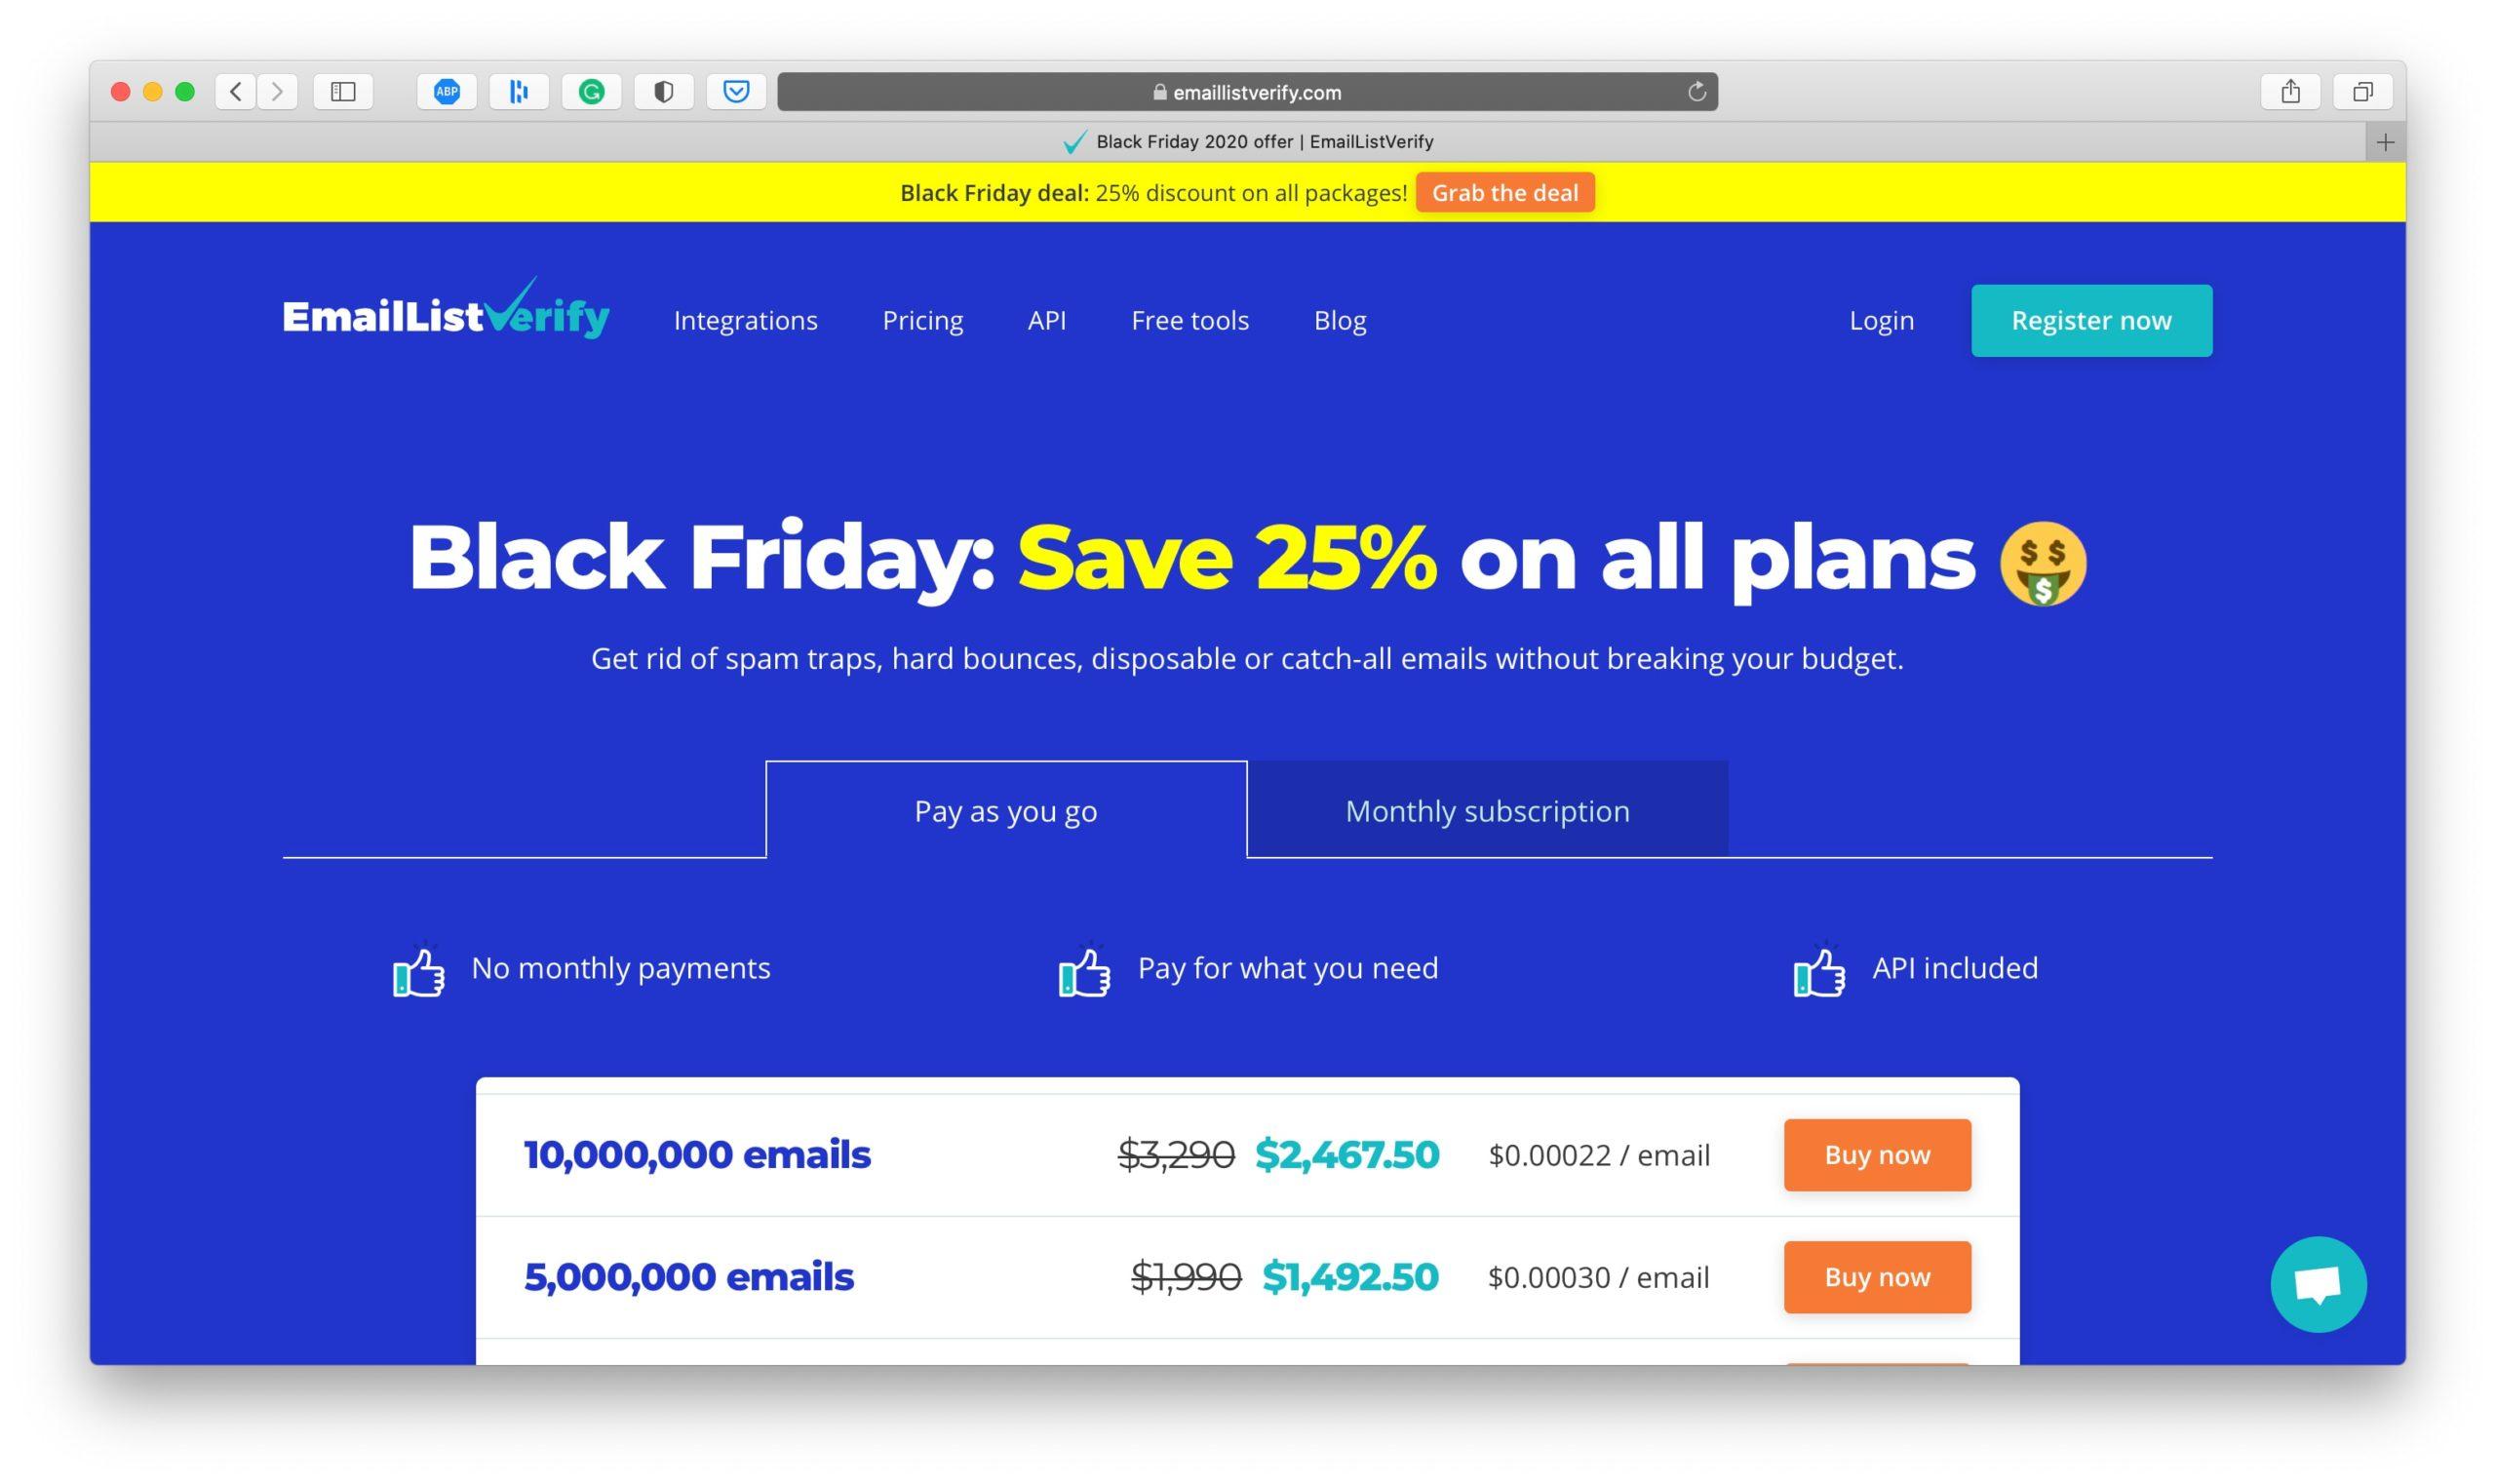 EmailListVerify Black Friday Deal